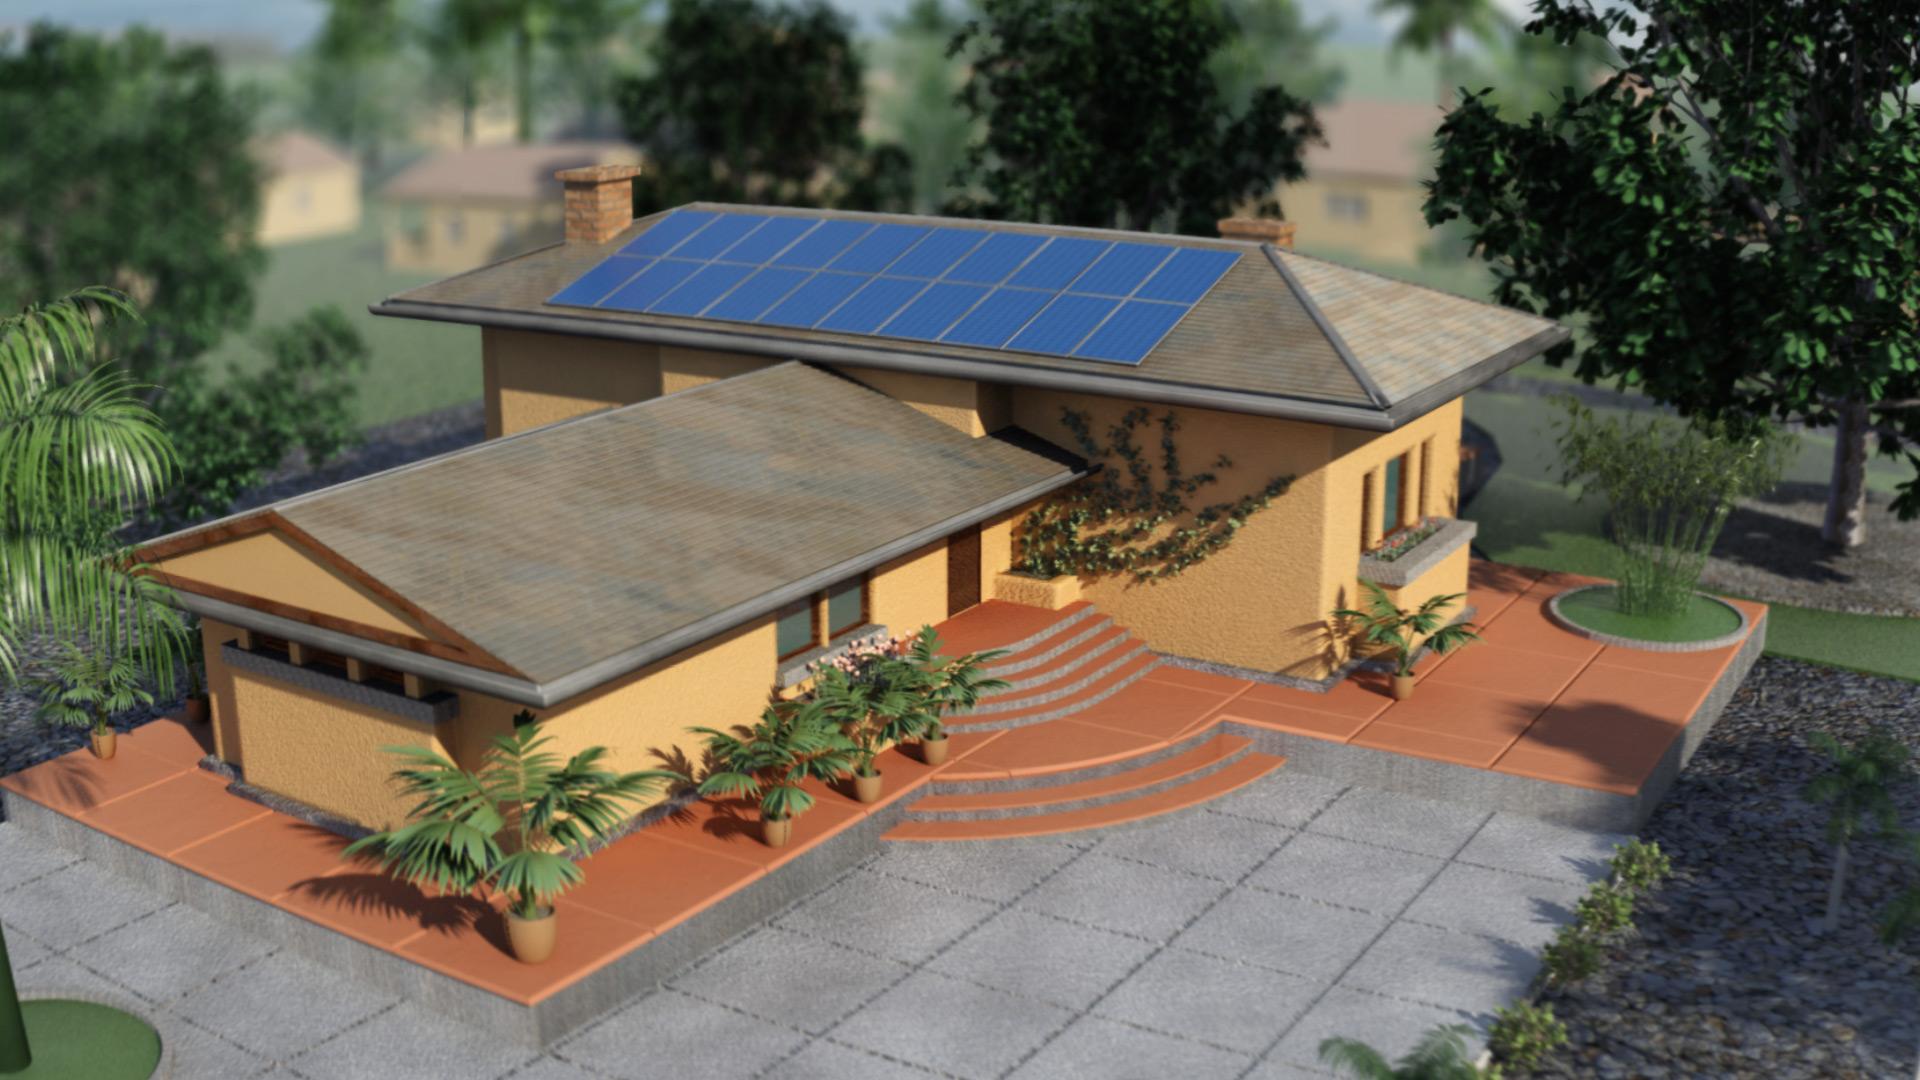 National Semiconductor SolarMagic Produc Demo